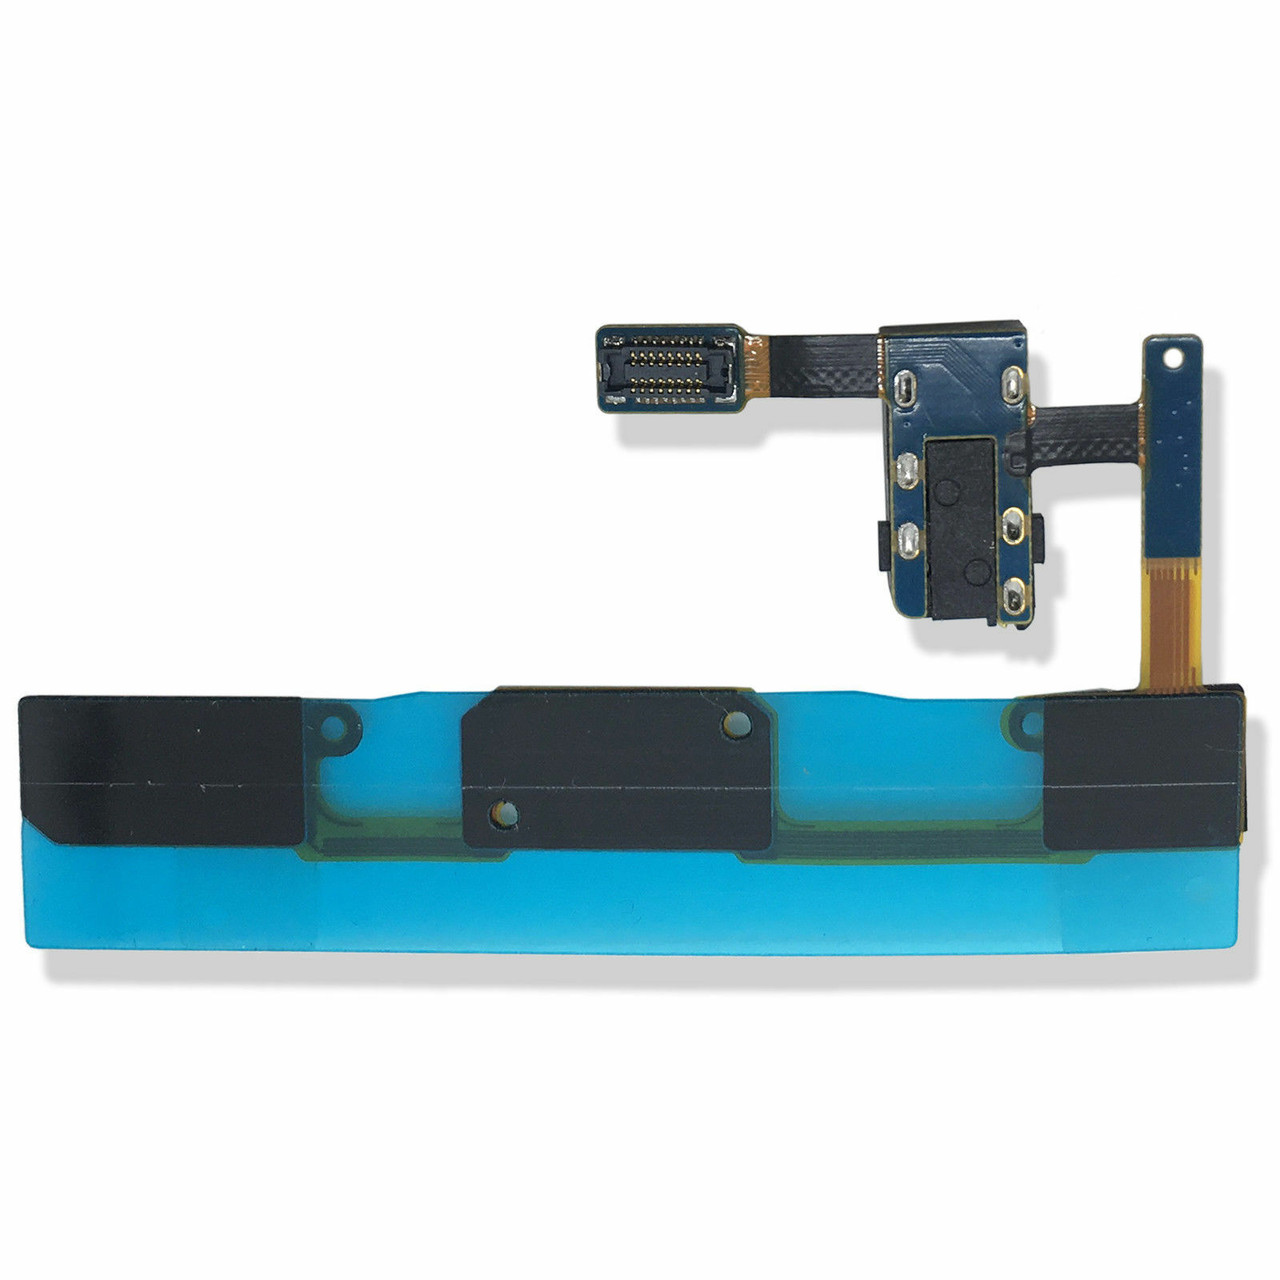 OEM Home Button Sensor Earphone Jack Flex Cable For Samsung Galaxy J7 2017 J727